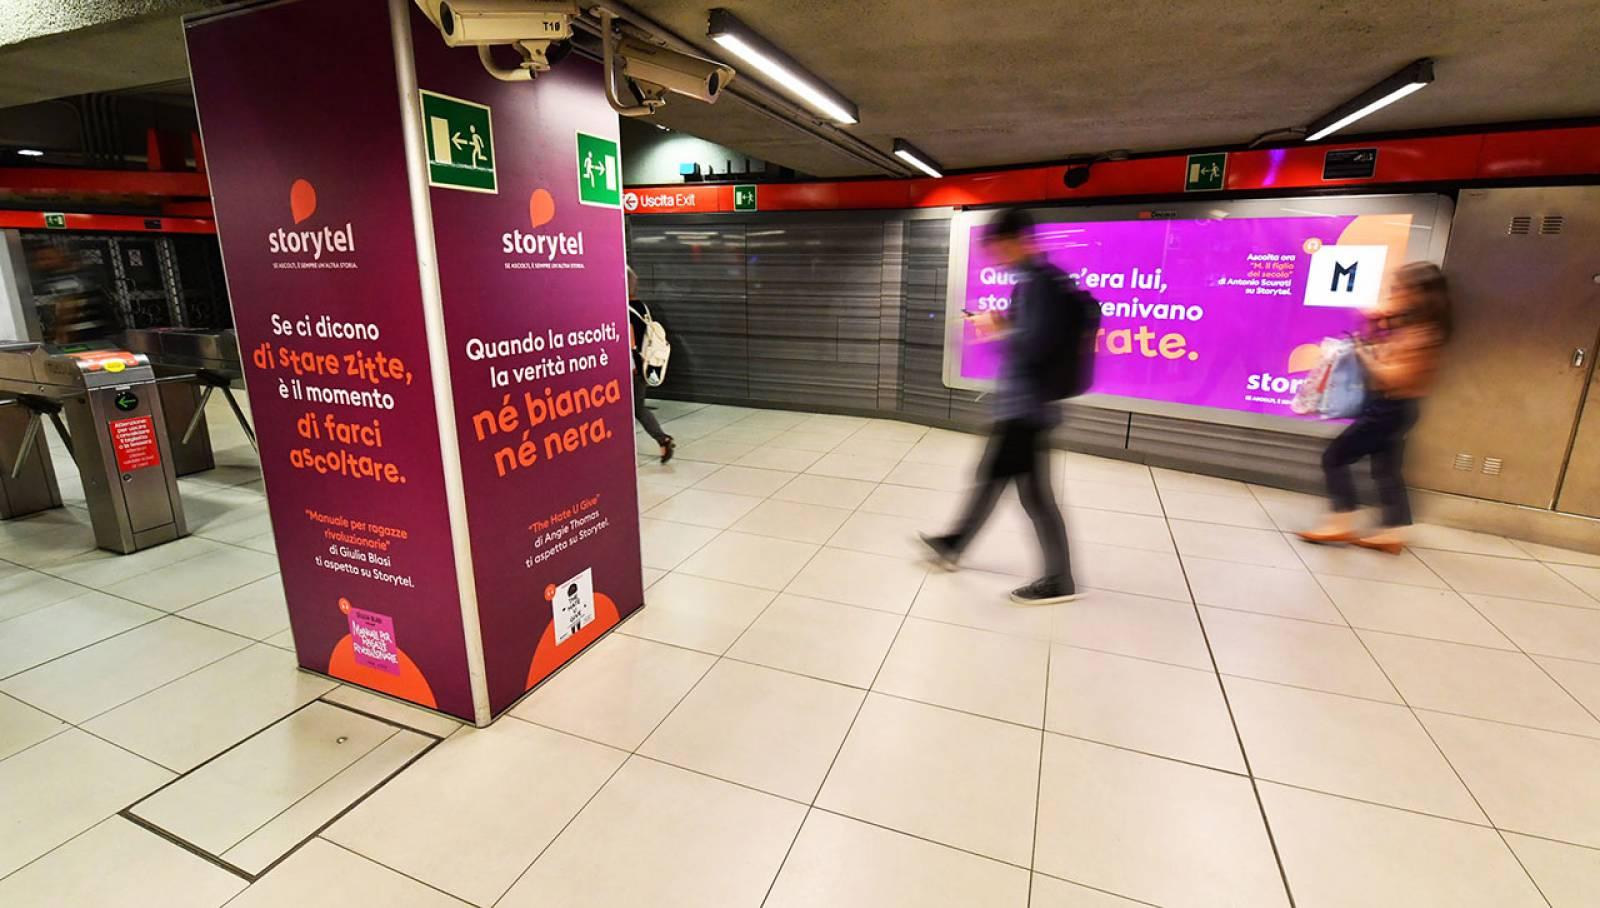 IGPDecaux Milan Station Domination for Storytel